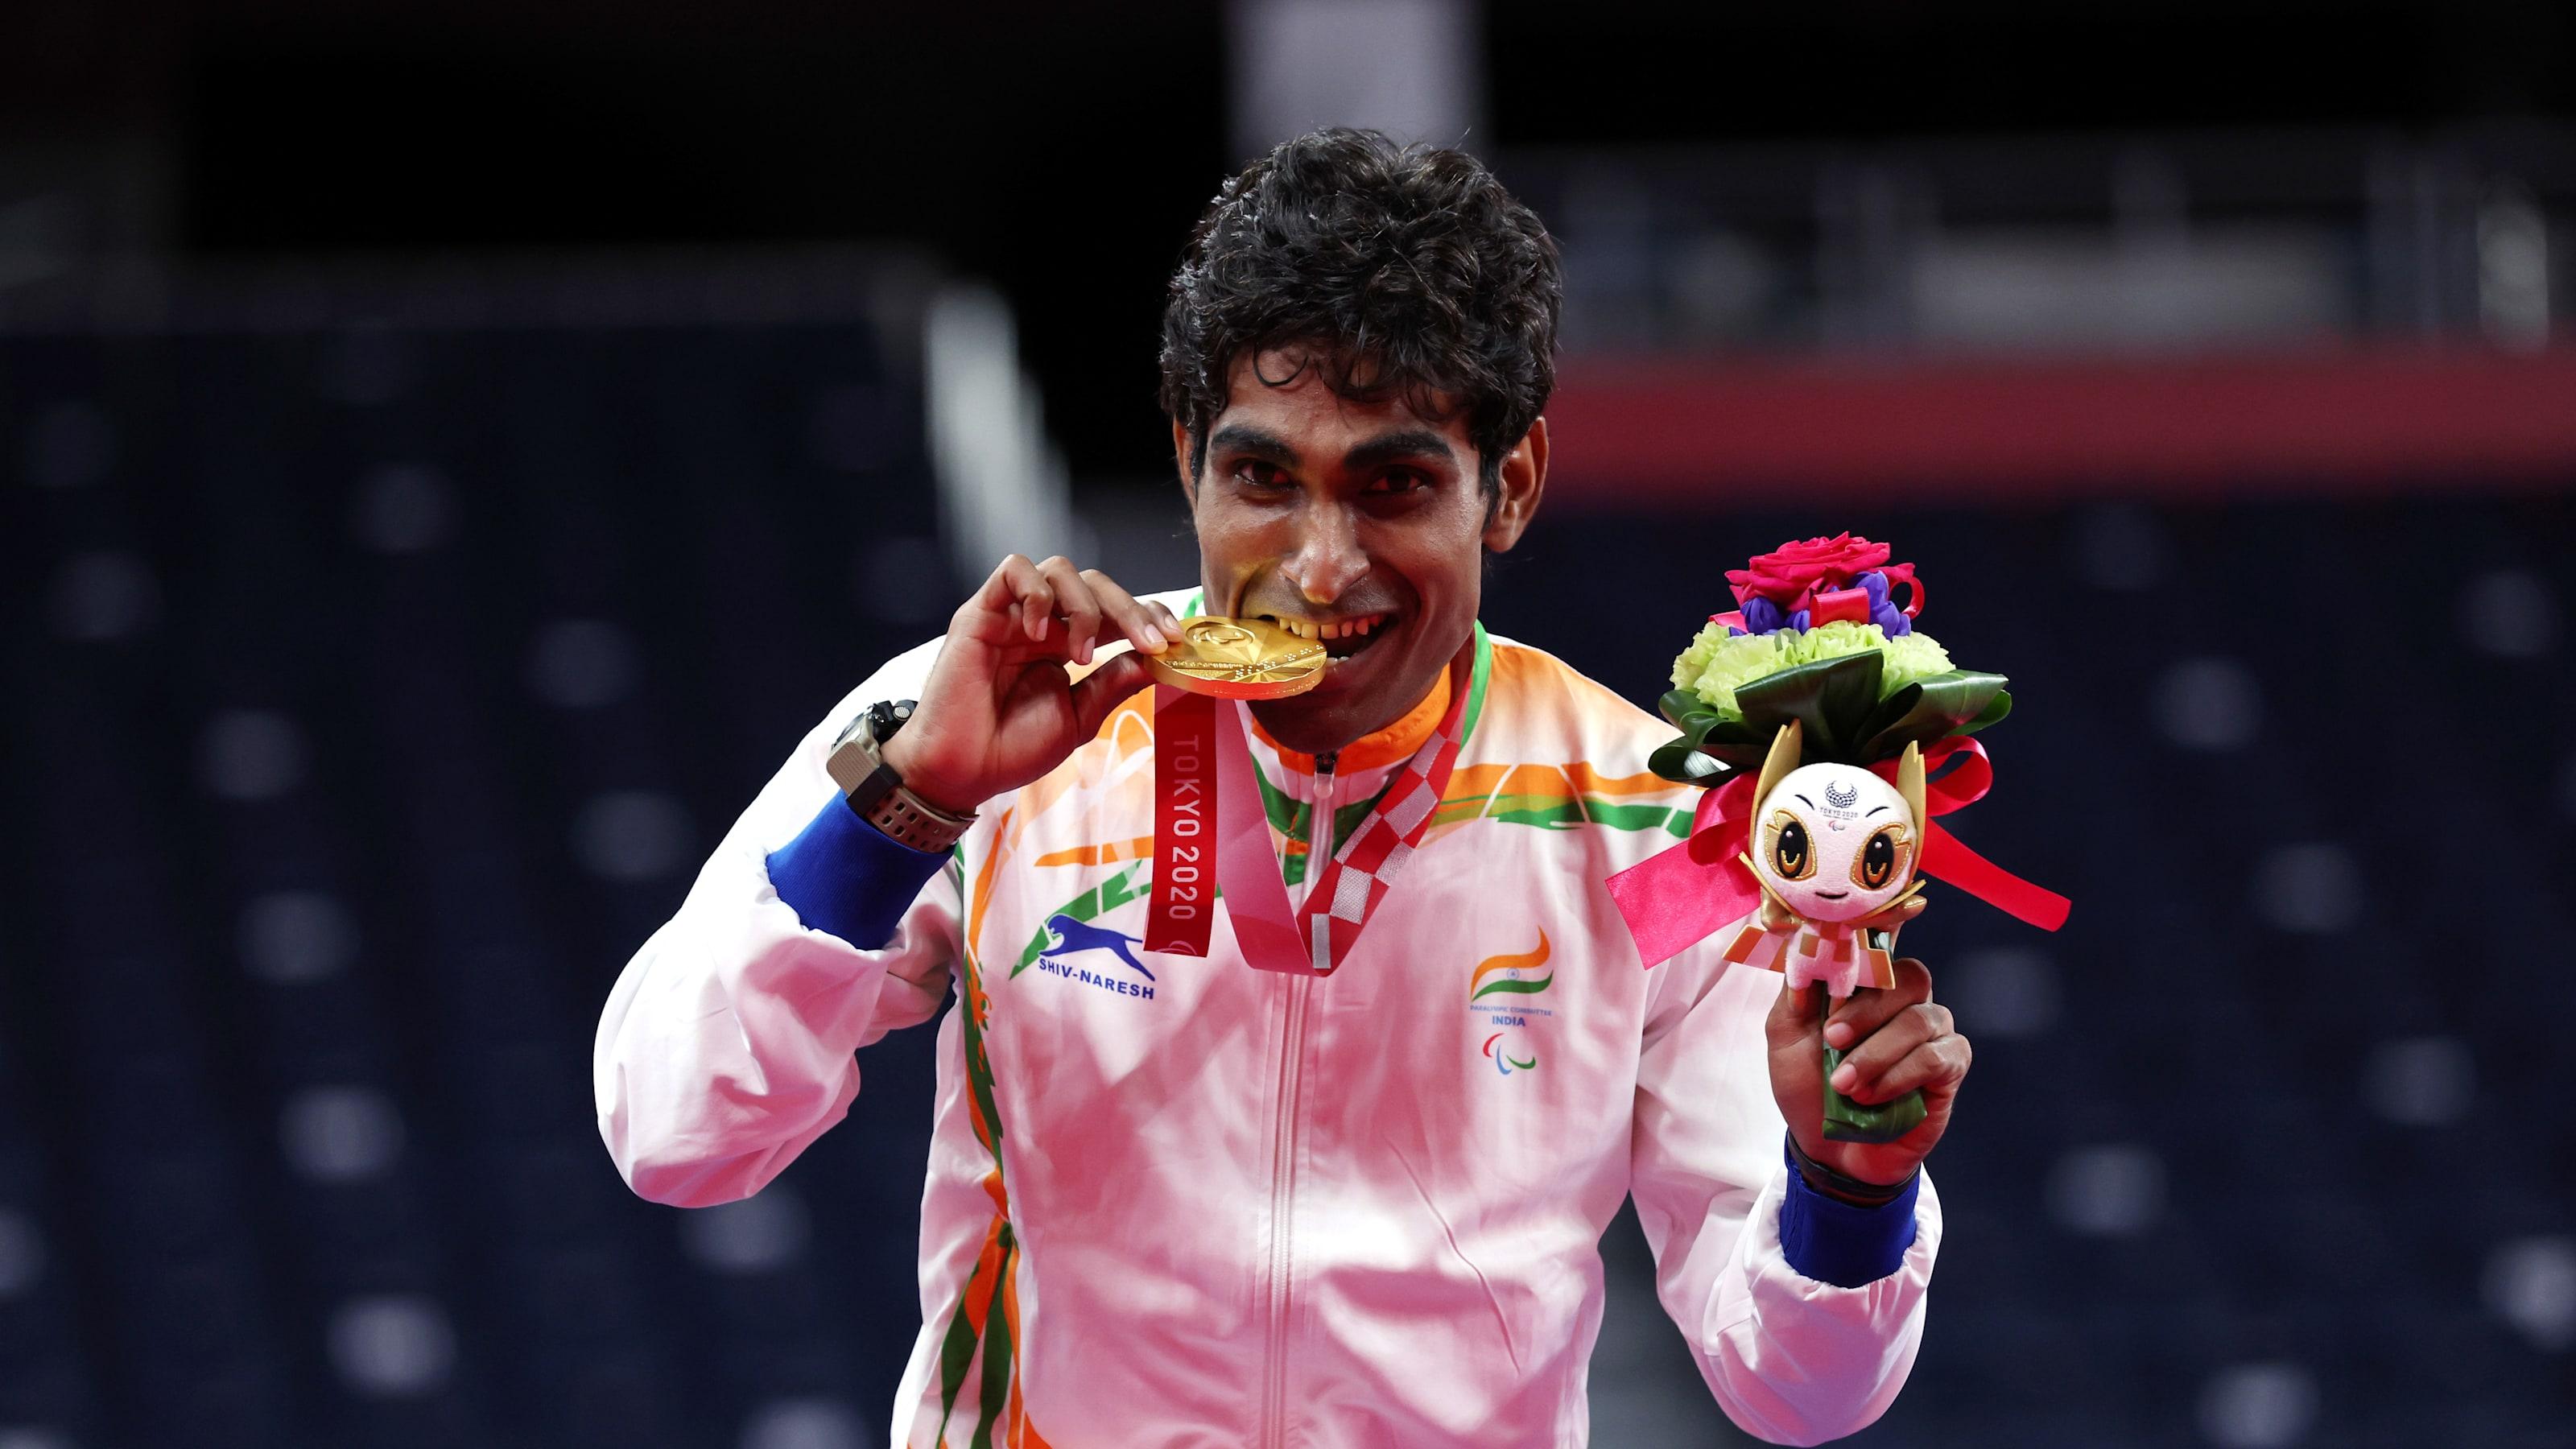 Brain and stamina: Pramod Bhagat's key weapons in Tokyo Paralympics success